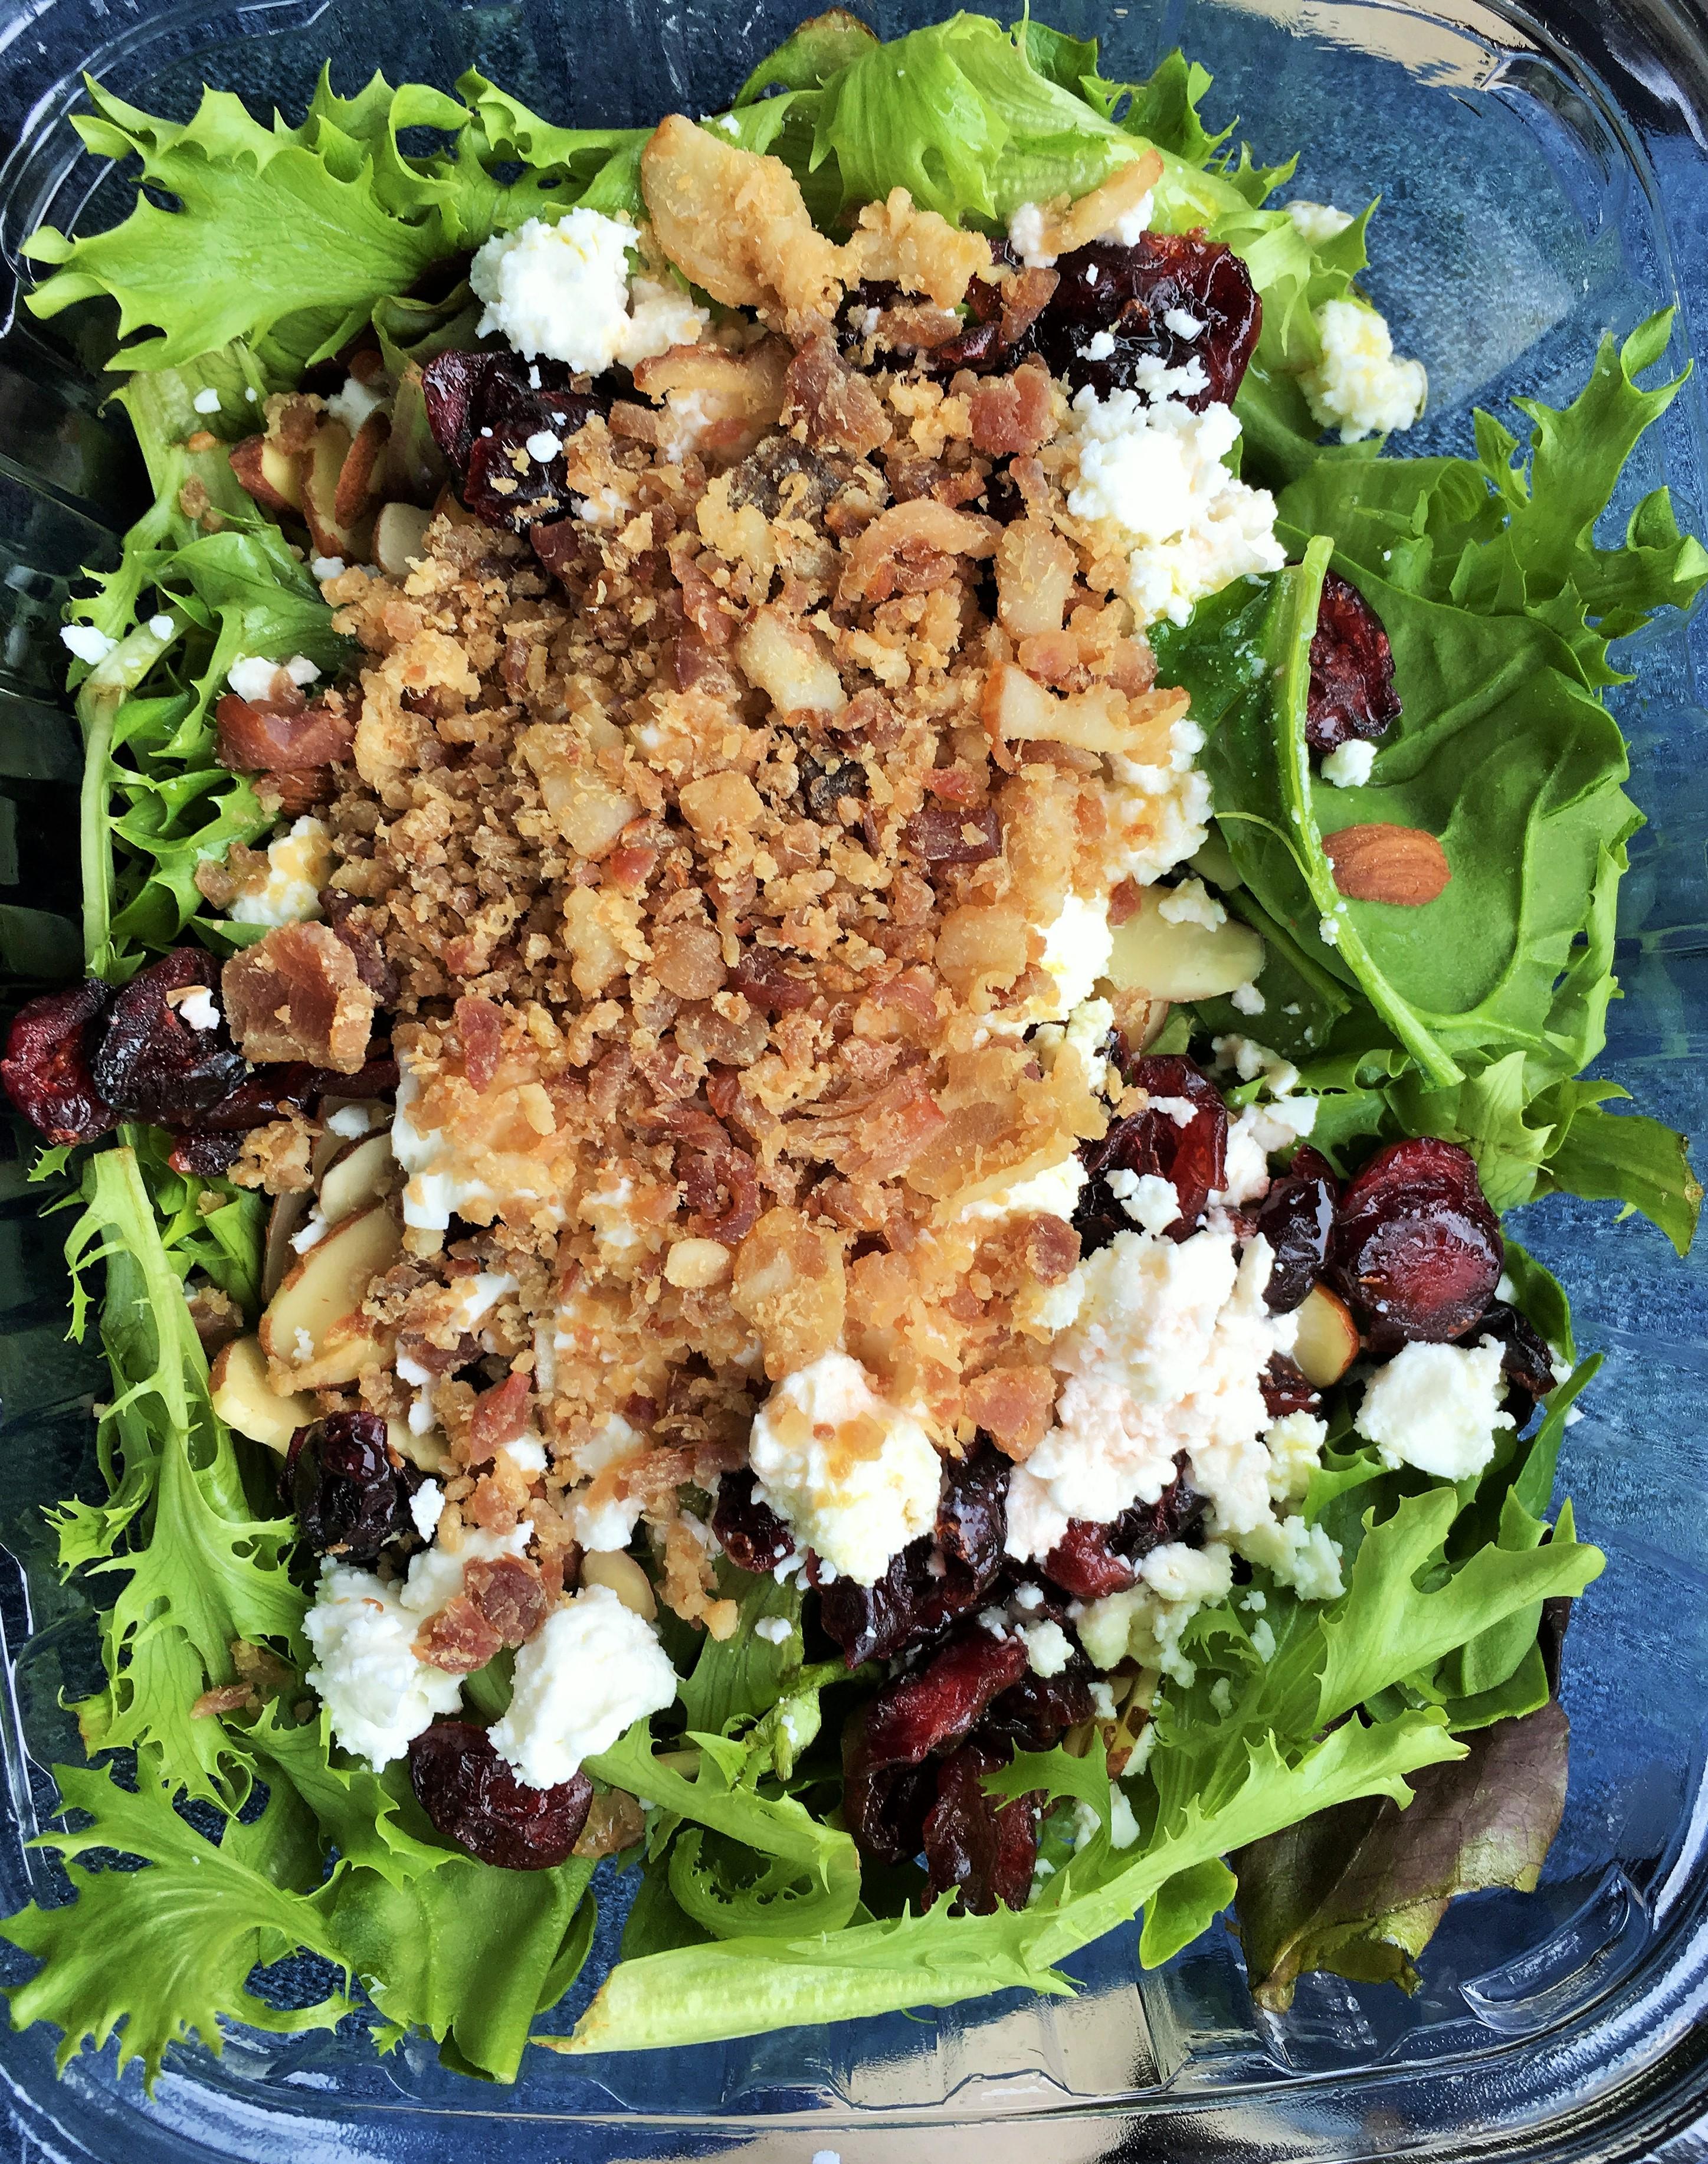 Cranberry Almond Salad was delicious.